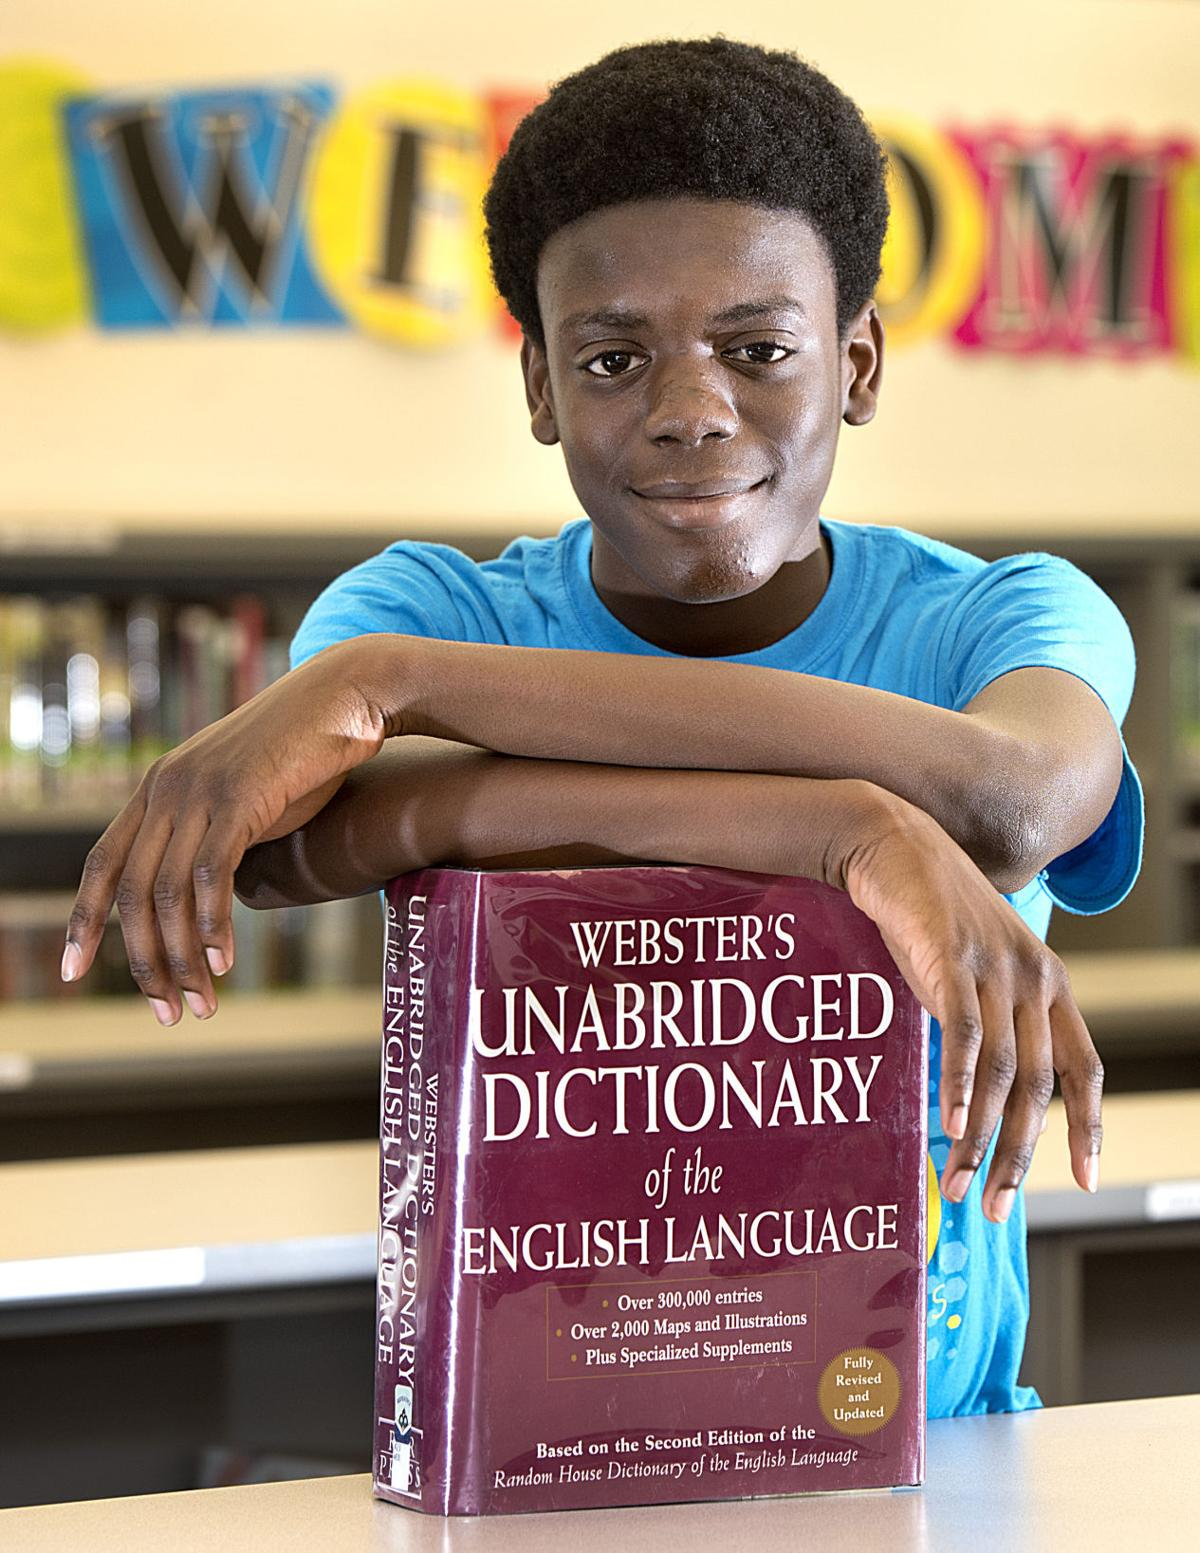 National Spelling Bee Nana Addo